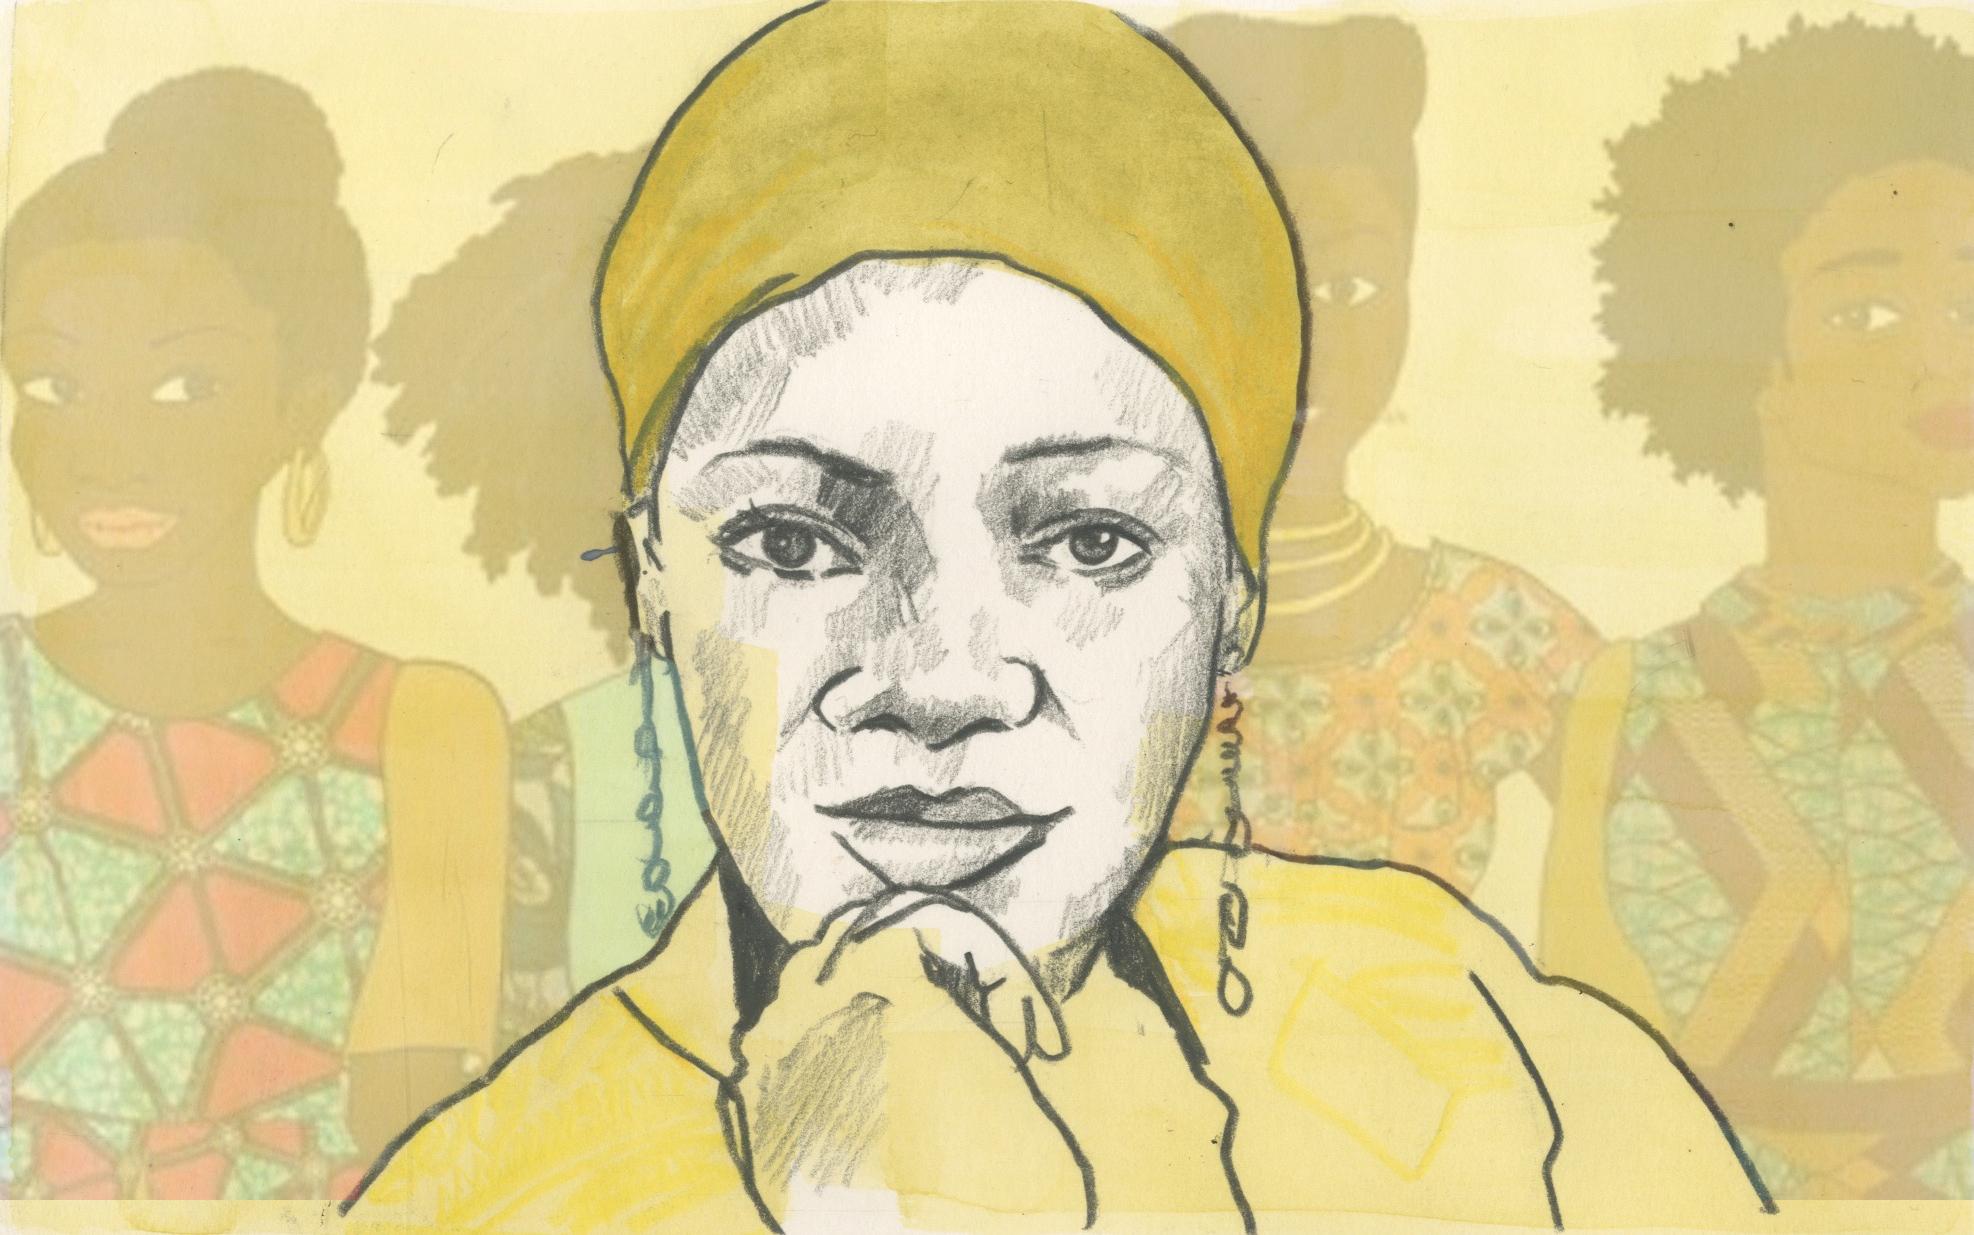 26/01/15 Nigerian author Oyindamola Affinnih who has written her latest novel ' A Tailor-made Romance'